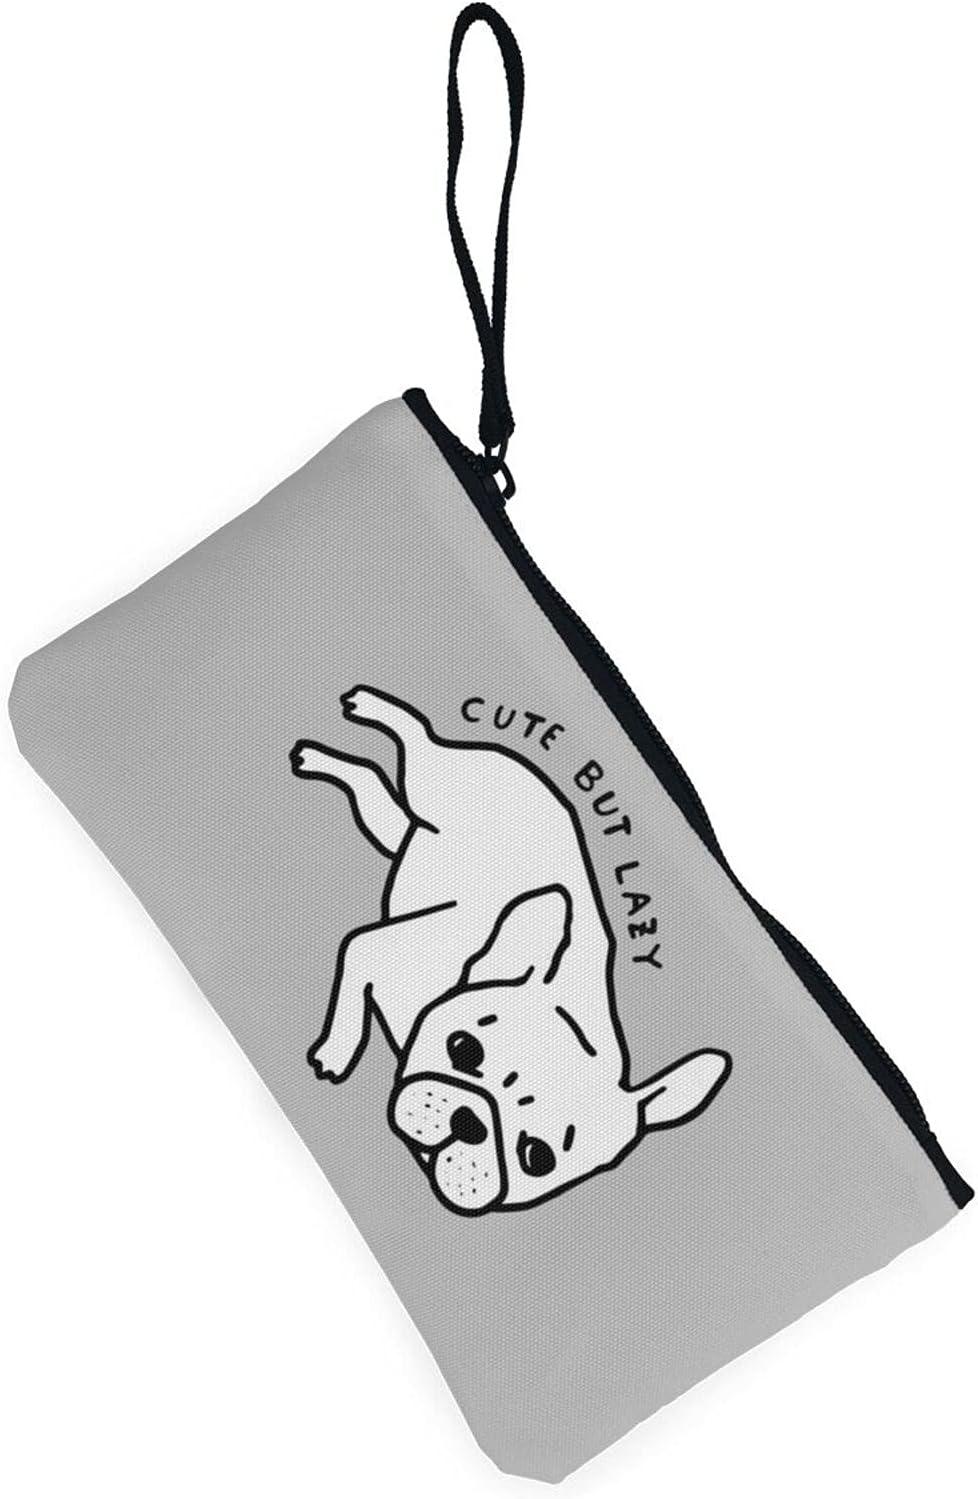 AORRUAM Dog pattern cute but lazy Canvas Coin Purse,Canvas Zipper Pencil Cases,Canvas Change Purse Pouch Mini Wallet Coin Bag